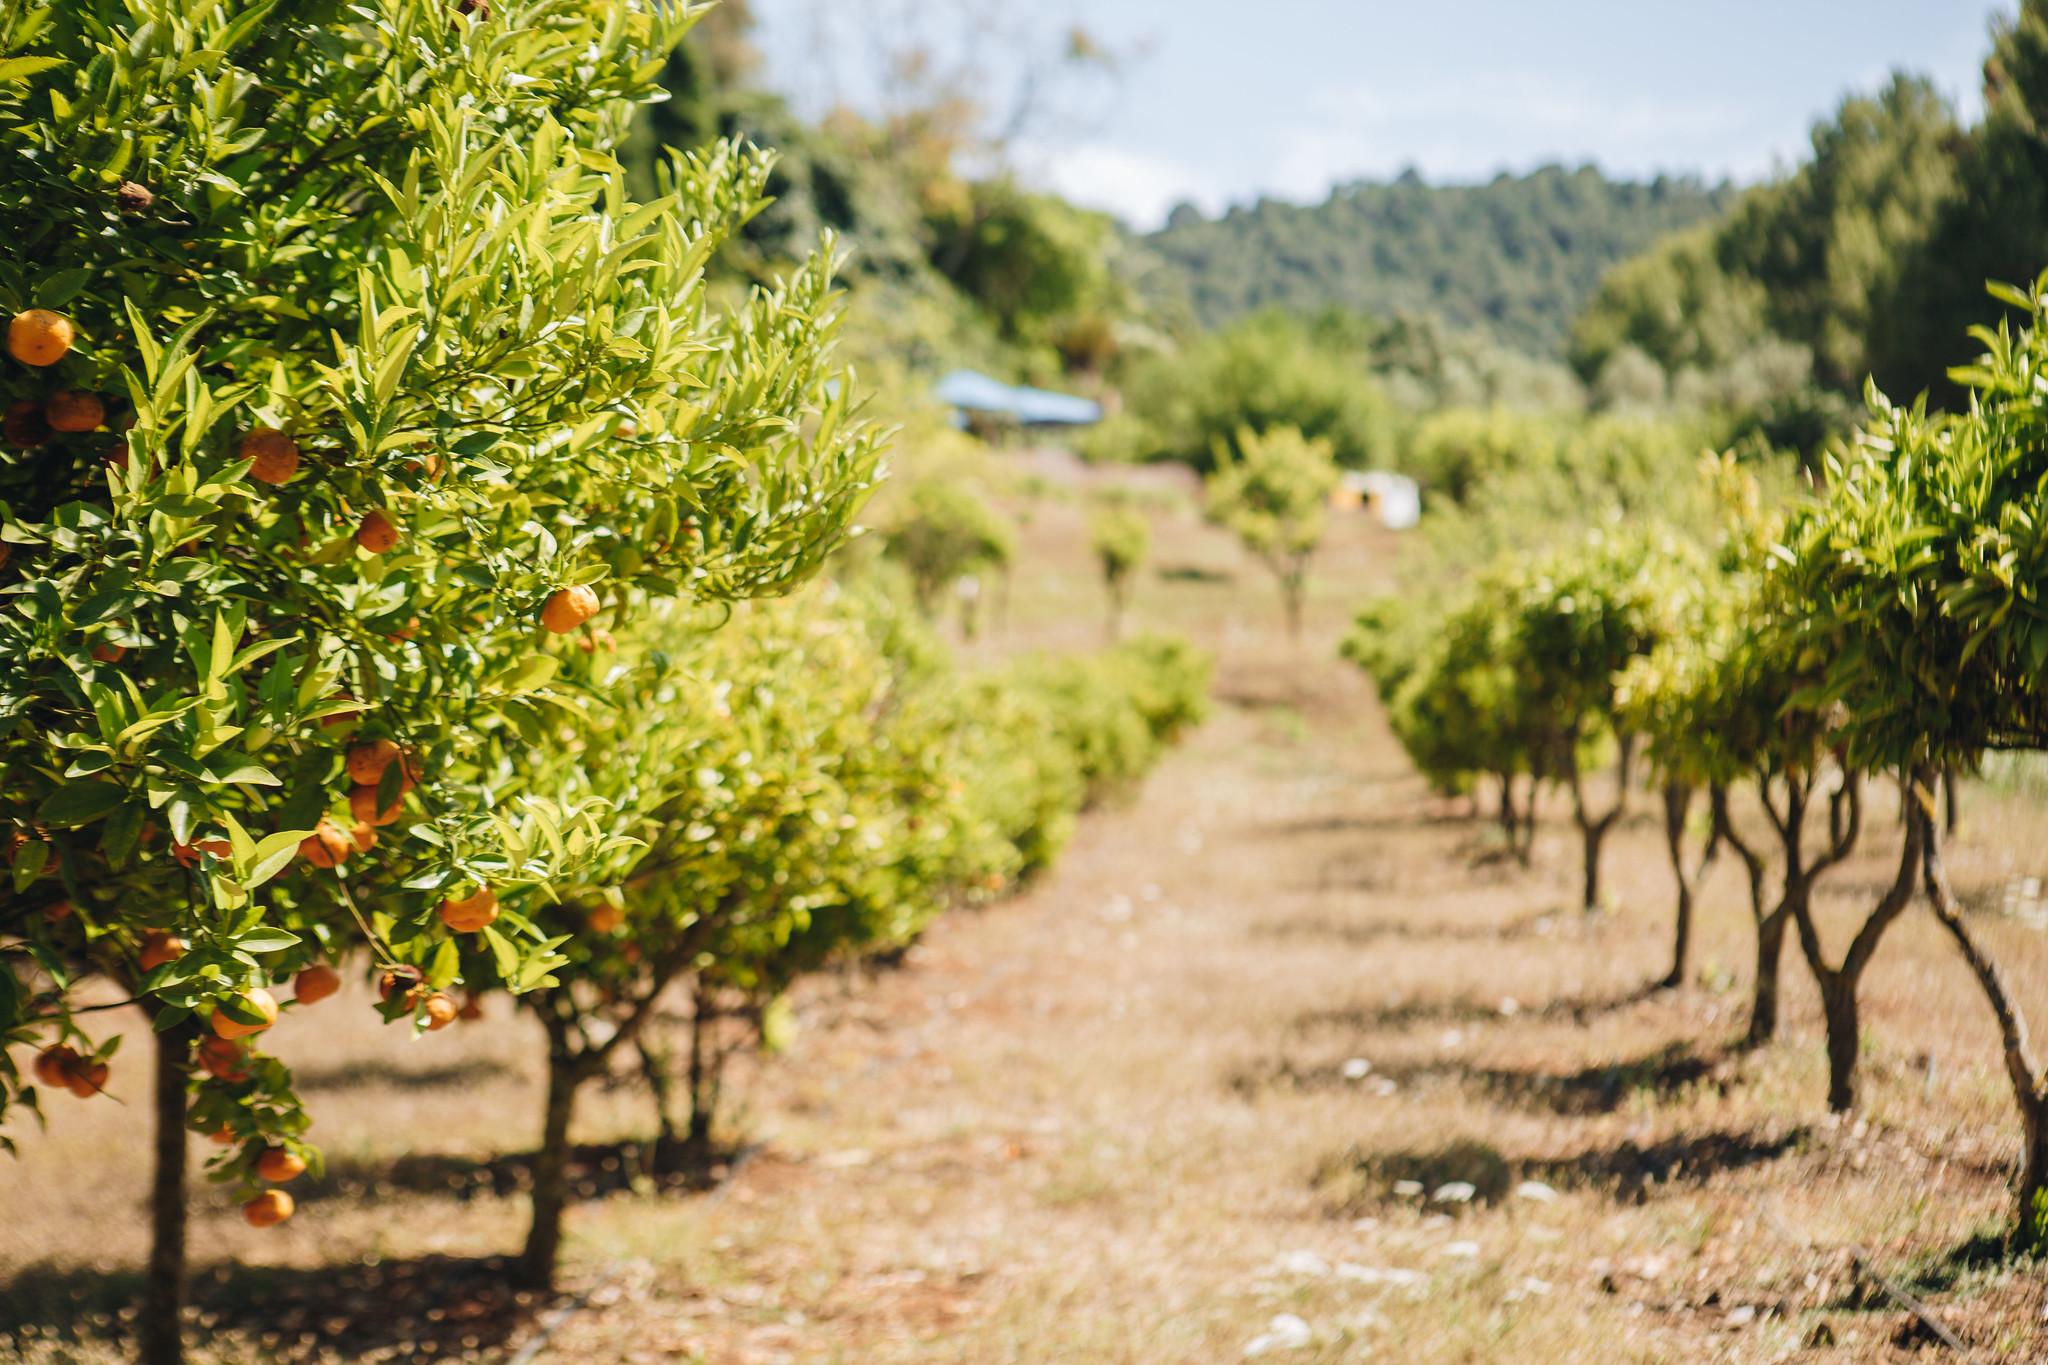 https://www.white-ibiza.com/wp-content/uploads/2020/05/white-ibiza-villas-can-amelida-exterior-citrus-grove.jpg